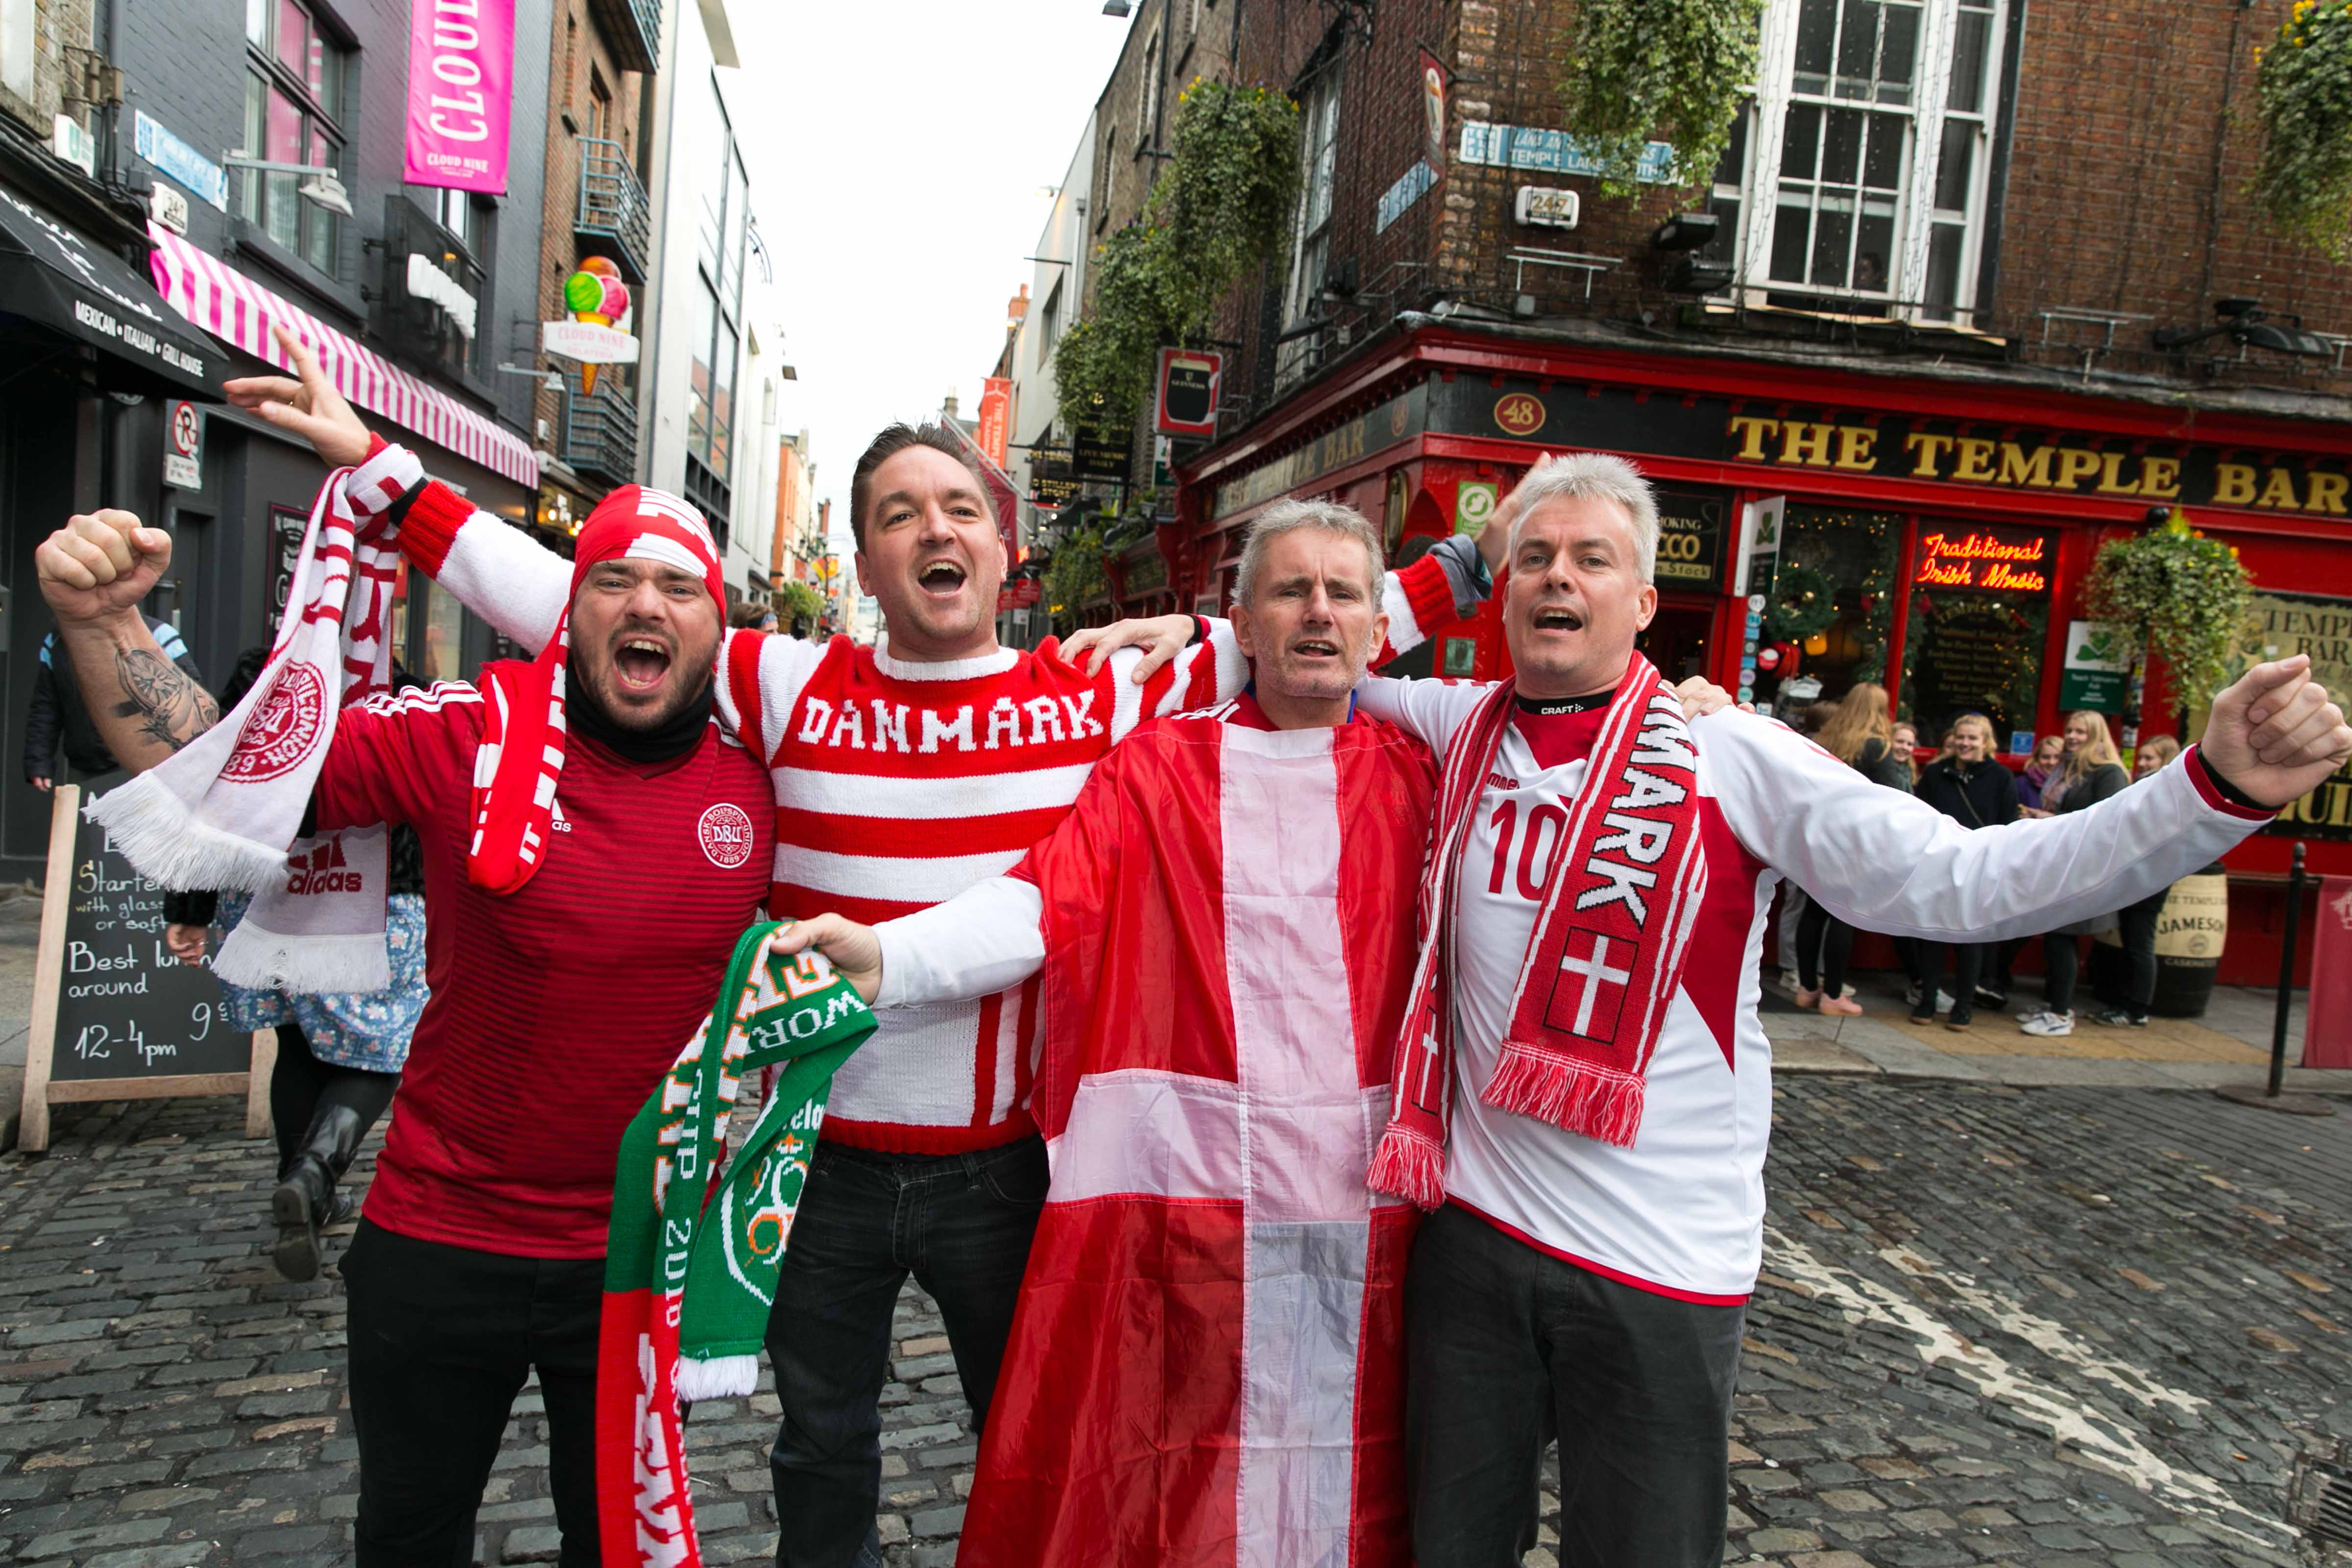 Danmark skal atter spille kvalifikations landskampe mod Irland – her er danske fans i Dublin. Foto: Tourism Ireland, Shane O'Neill, SON Photographic.